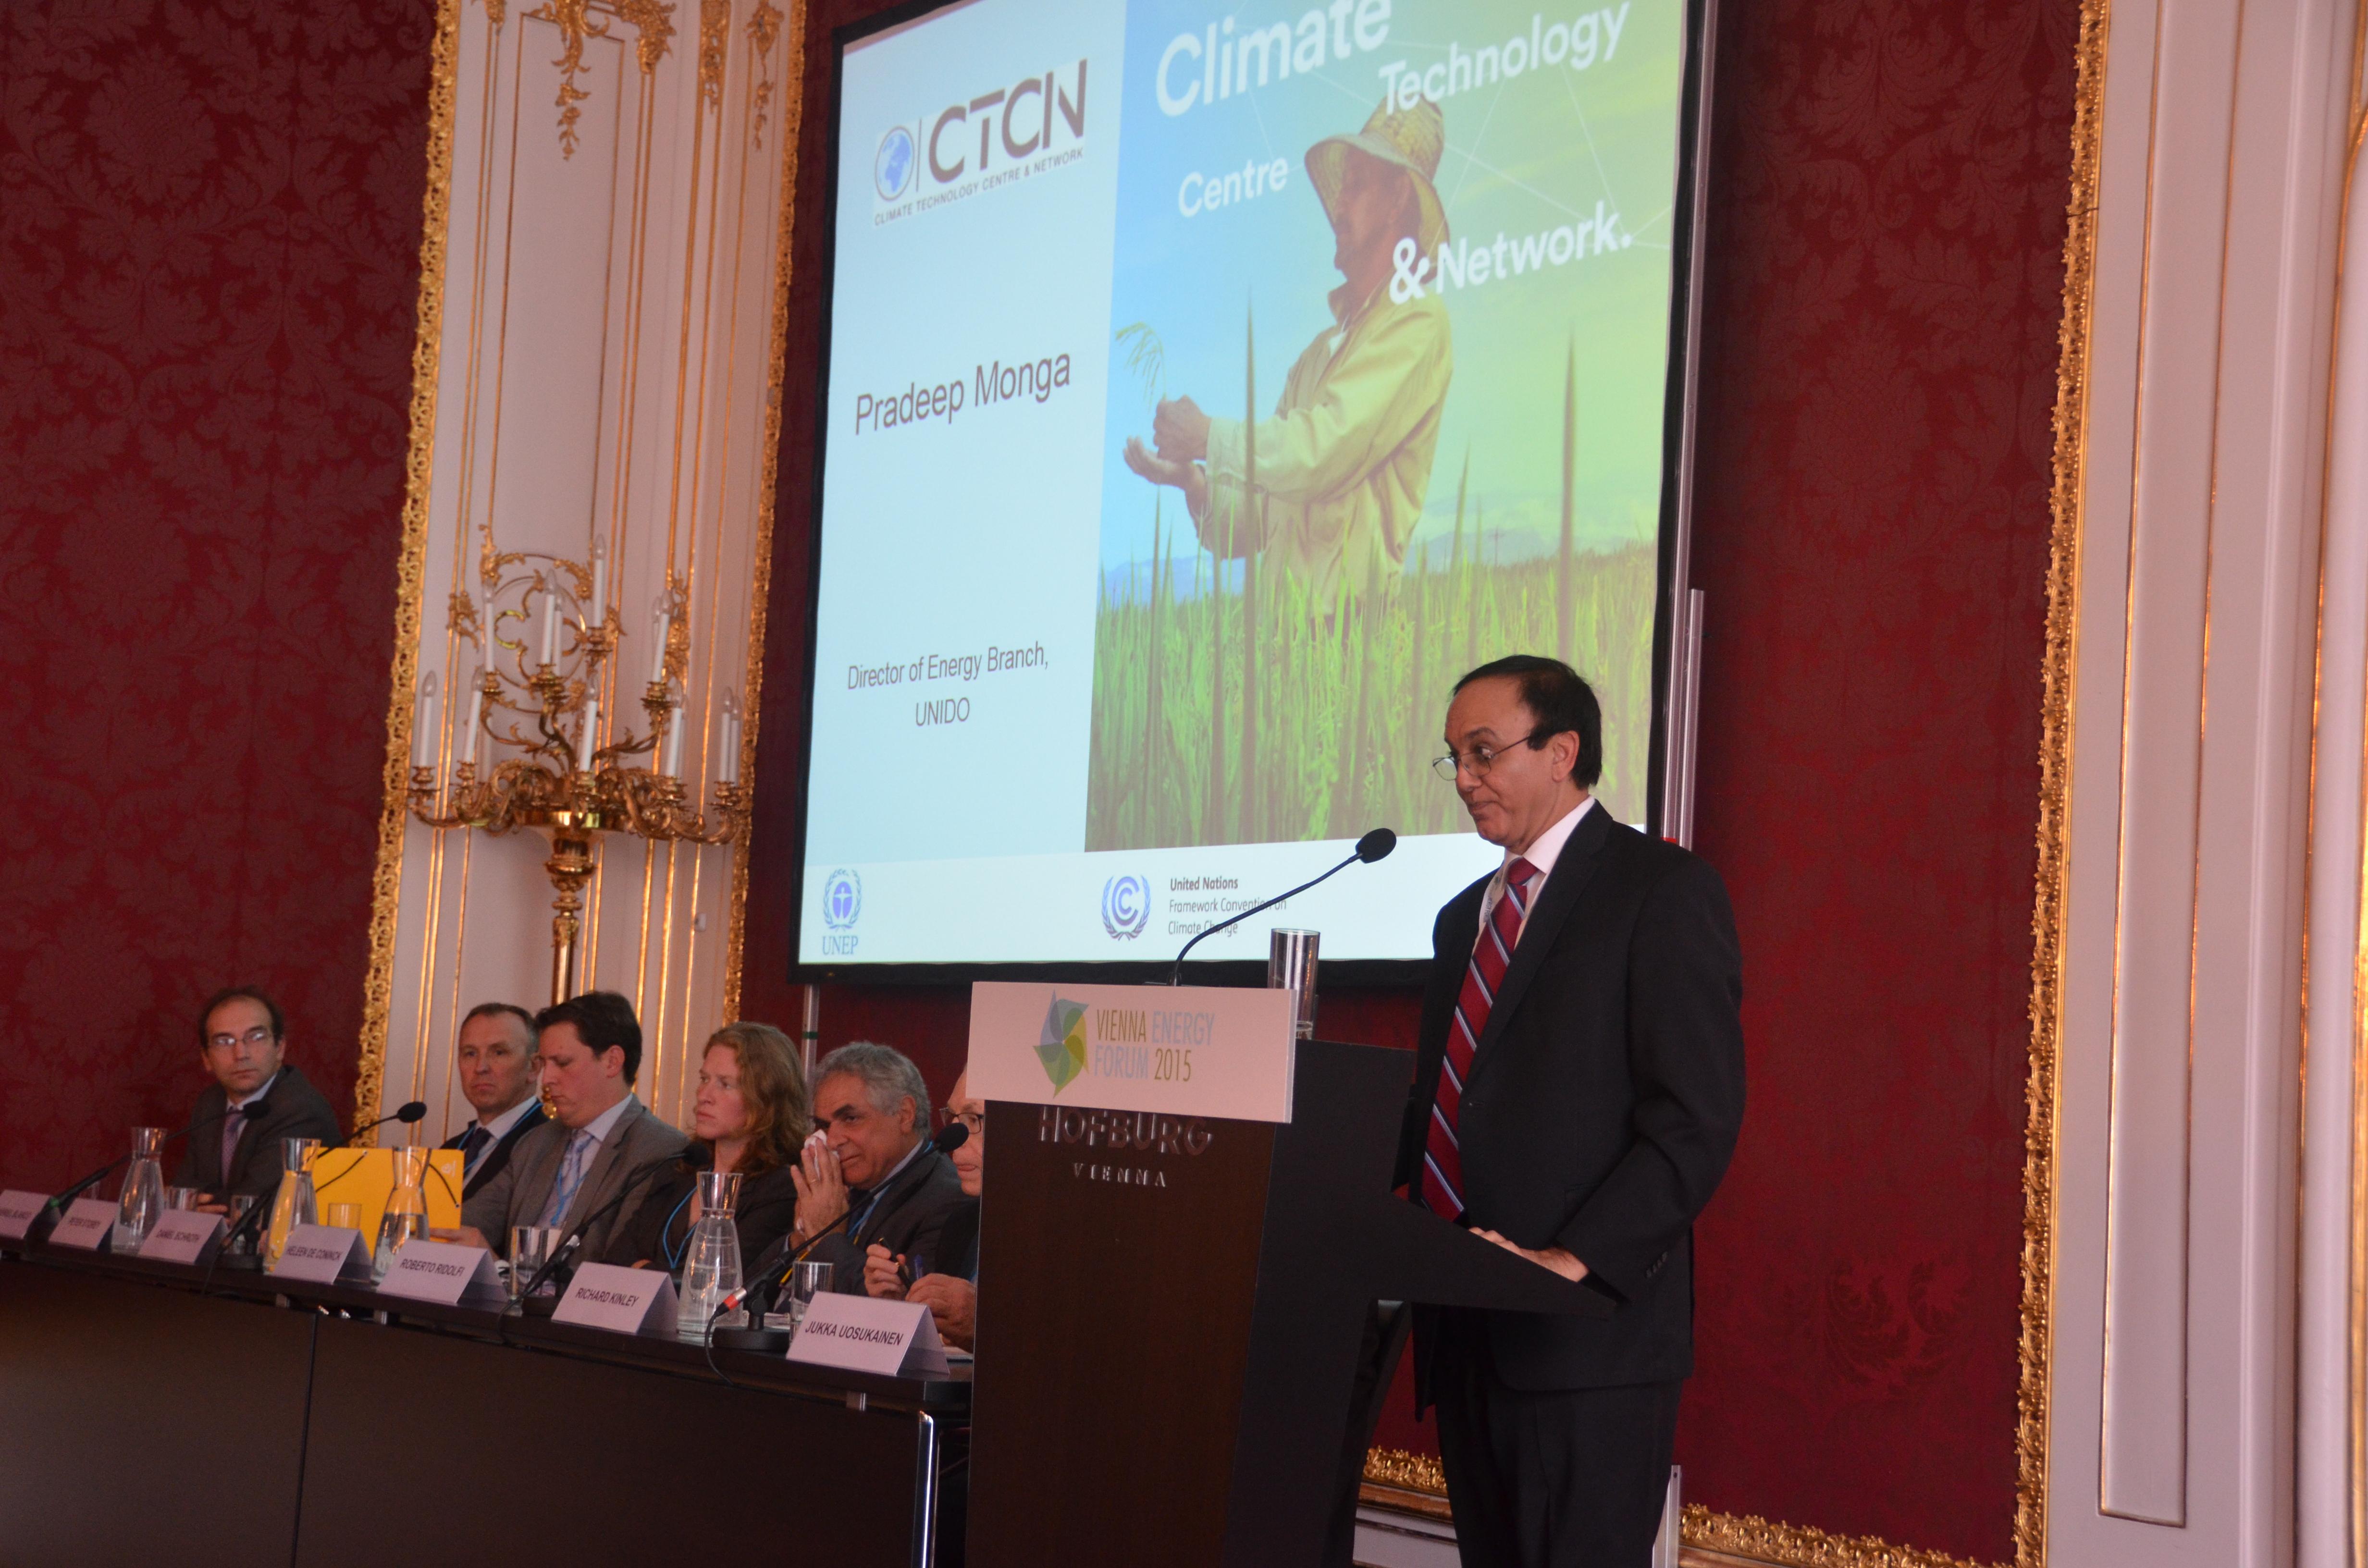 Vienna_Energy_Forum_2015 183.JPG